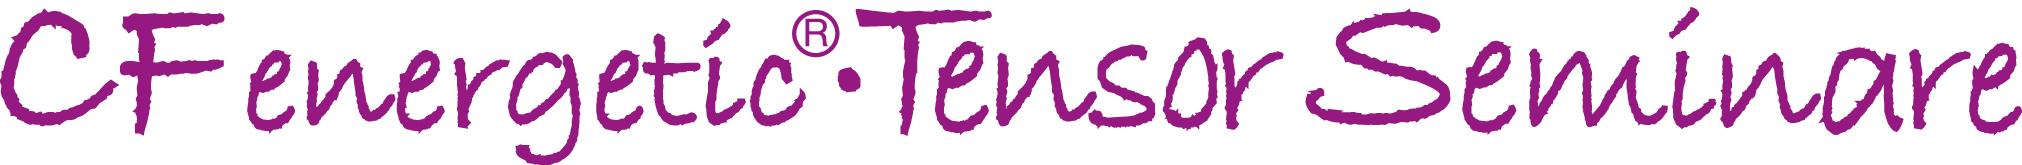 Logo cf ernergetic Tensorseminare Kopie